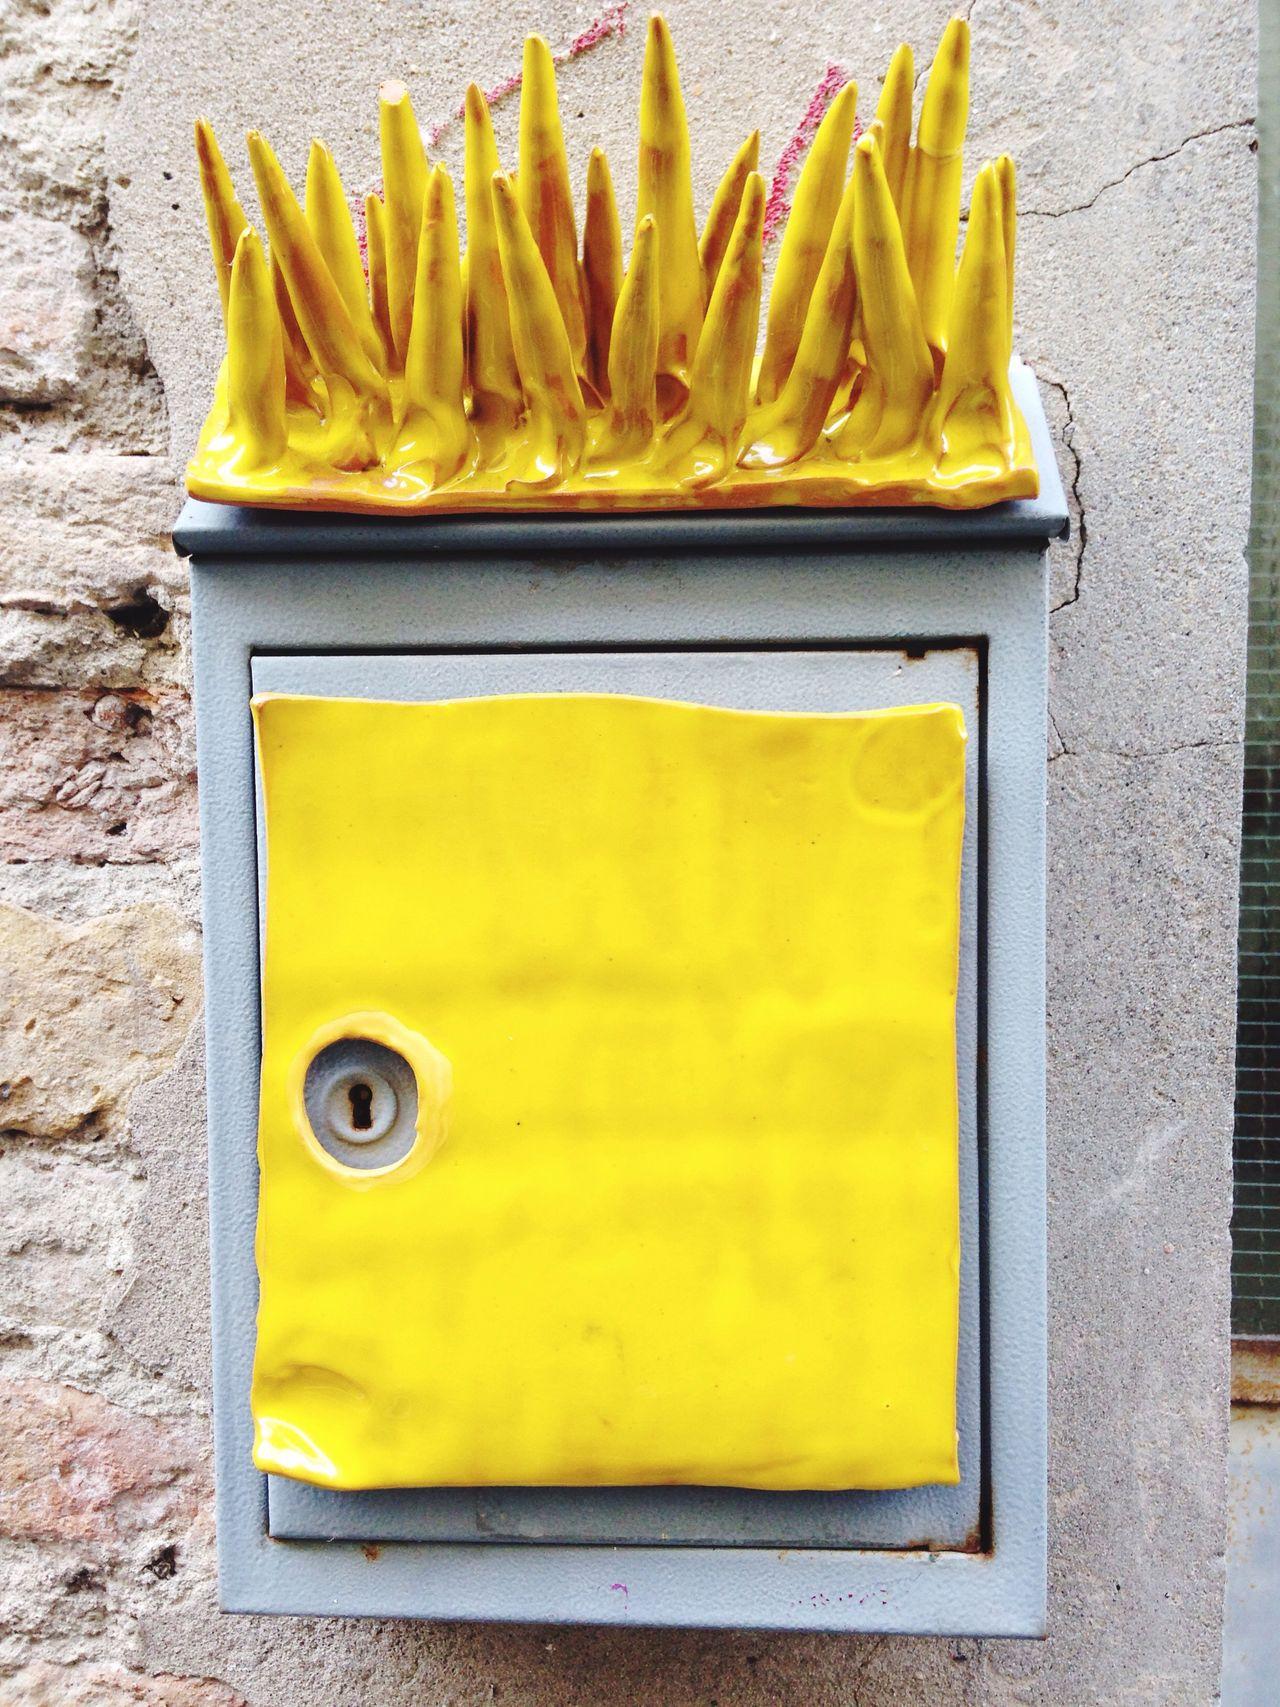 Dangerous Mailbox 😈 Sofiavicchi Sofiavicchiconceptdesign Ceramica Maiolica Art ArtWork Posta Post Mail Letters Penpals Streetphotography Street Photography Buchetta Faenza Romagna Punk Punk Rock